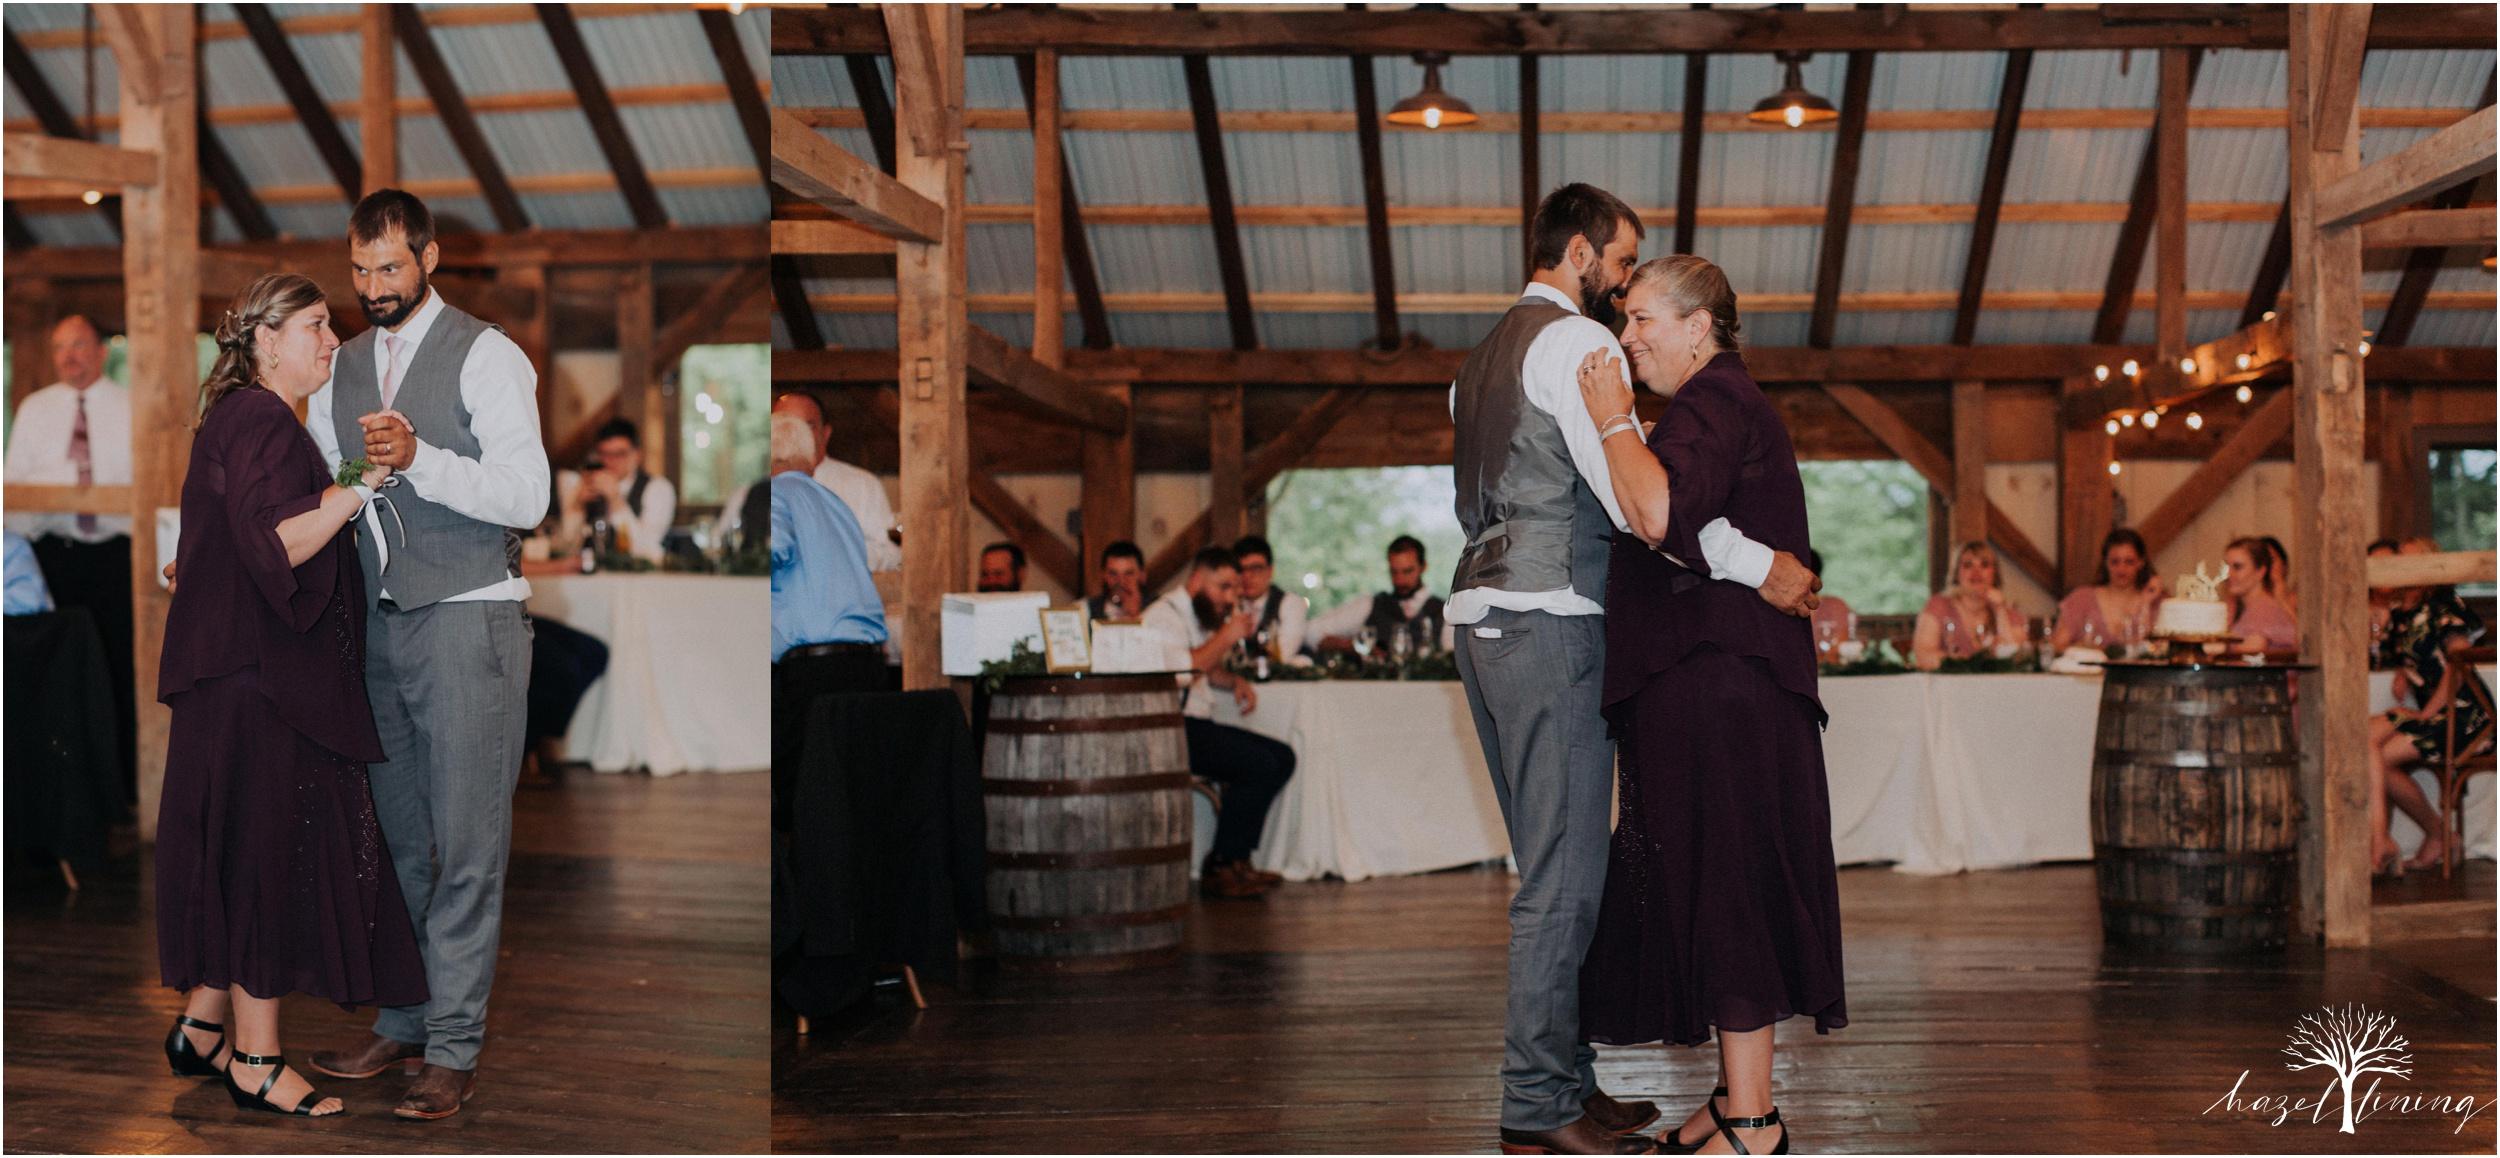 hazel-lining-travel-wedding-elopement-photography-lisa-landon-shoemaker-the-farm-bakery-and-events-bucks-county-quakertown-pennsylvania-summer-country-outdoor-farm-wedding_0134.jpg